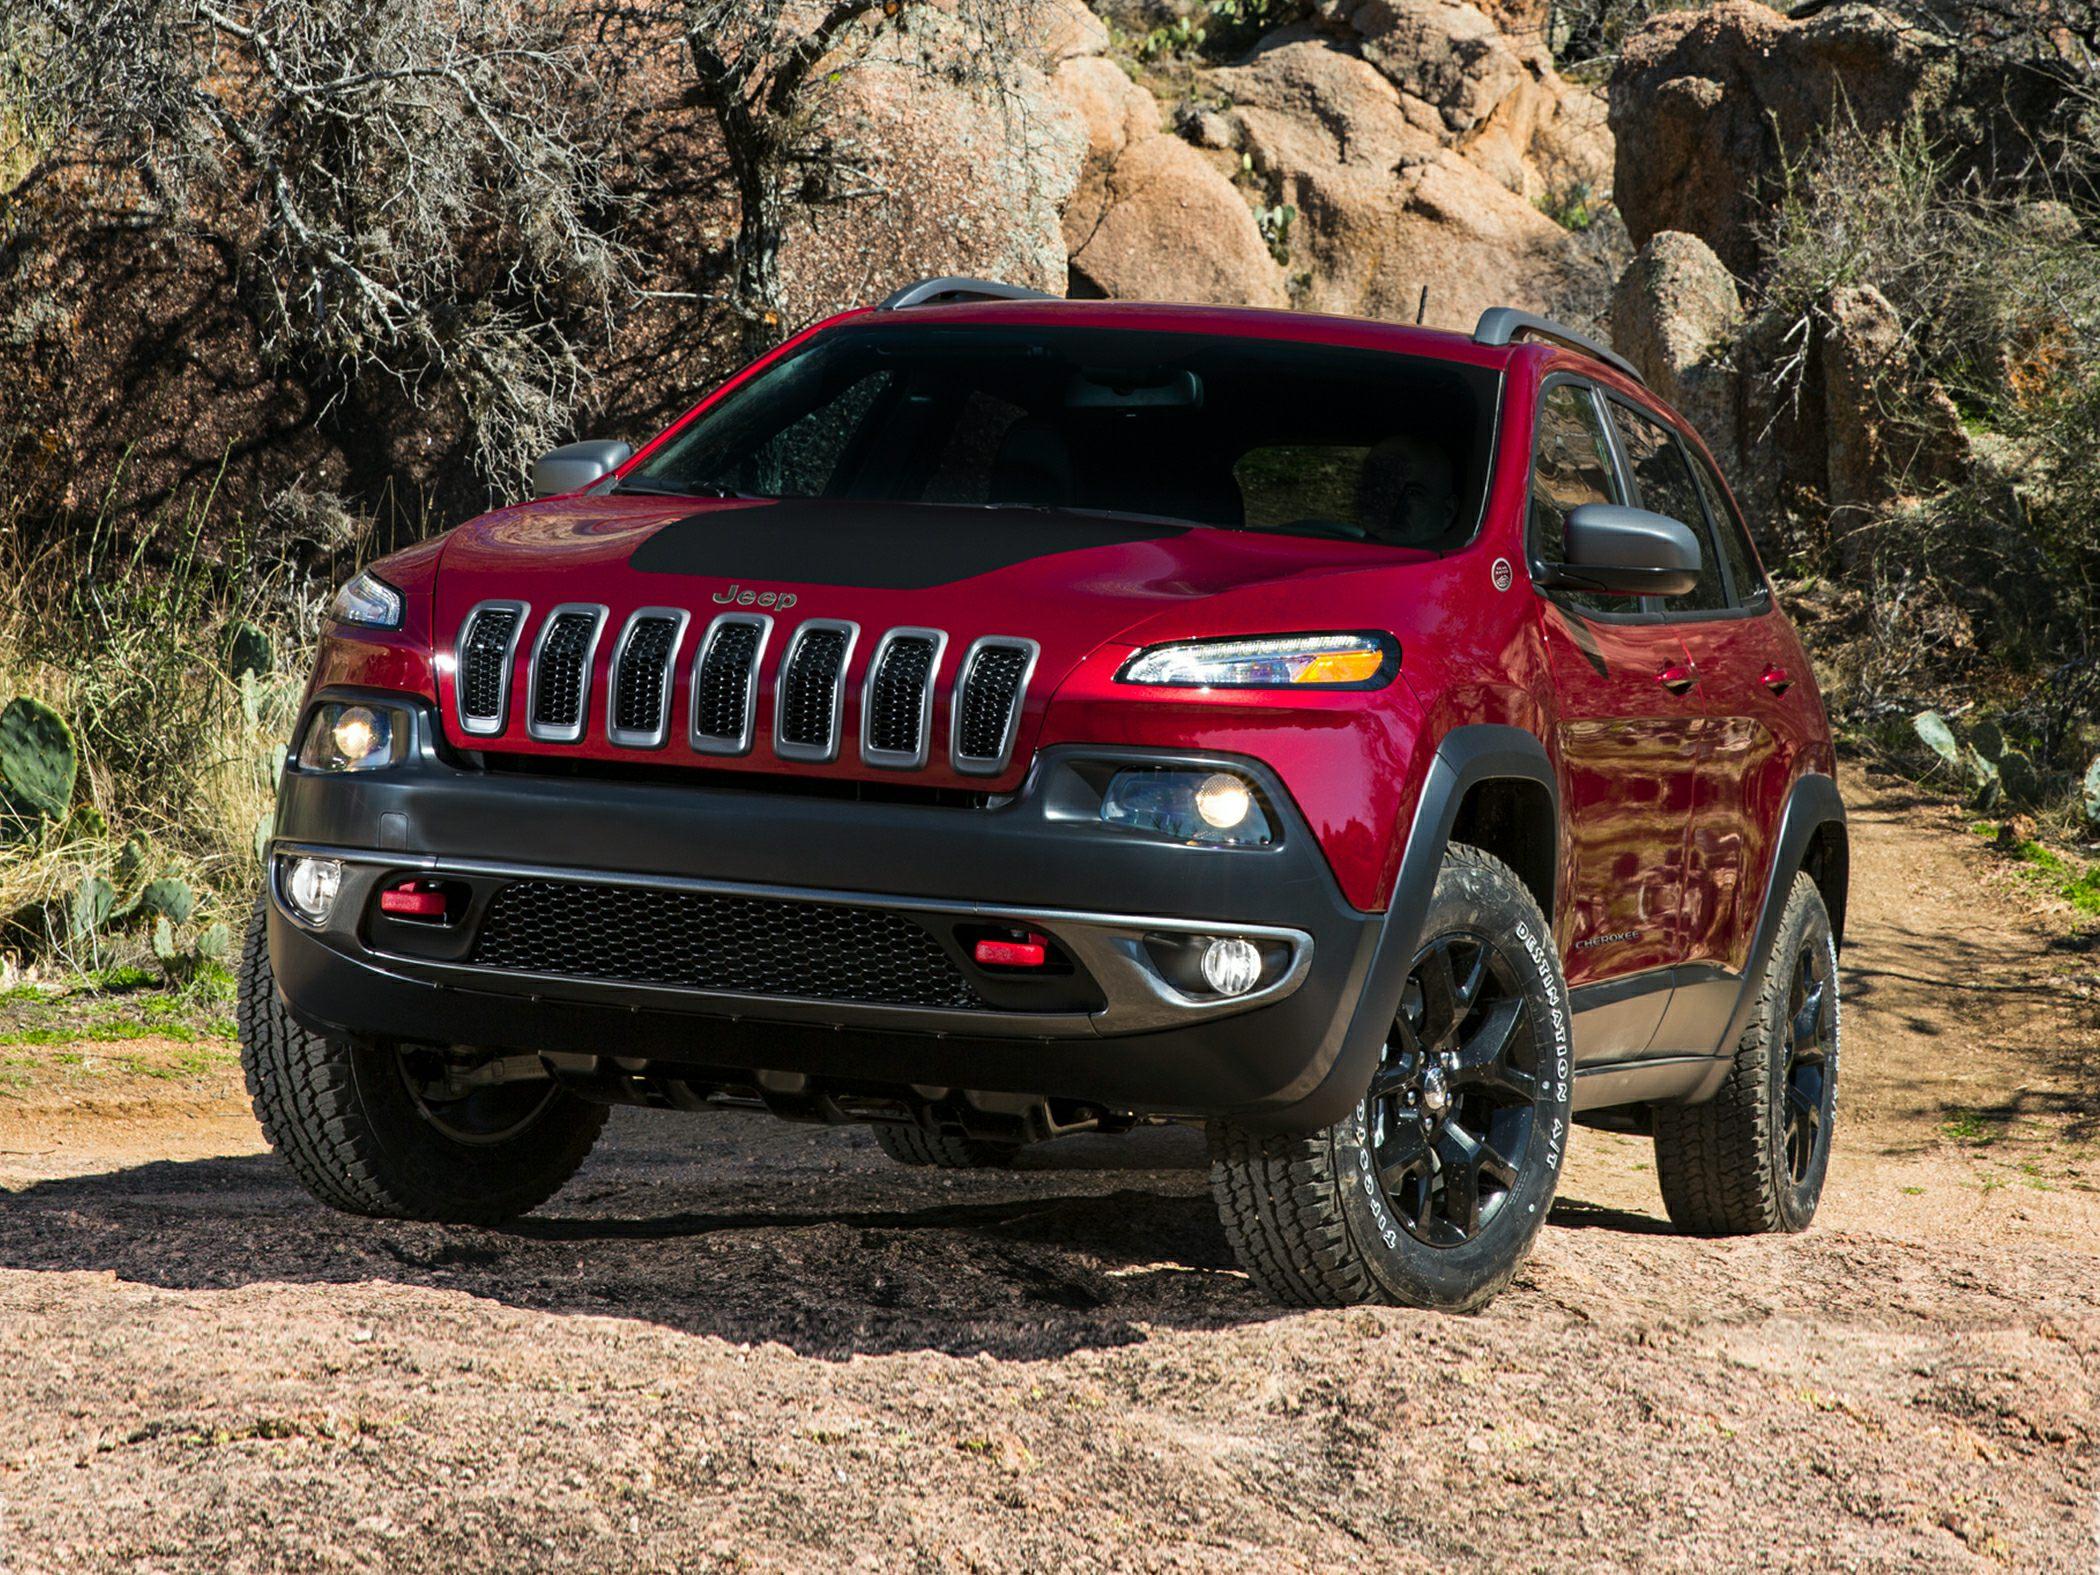 Car Repair Estimate >> 2017 Jeep Cherokee Reviews, Specs and Prices   Cars.com